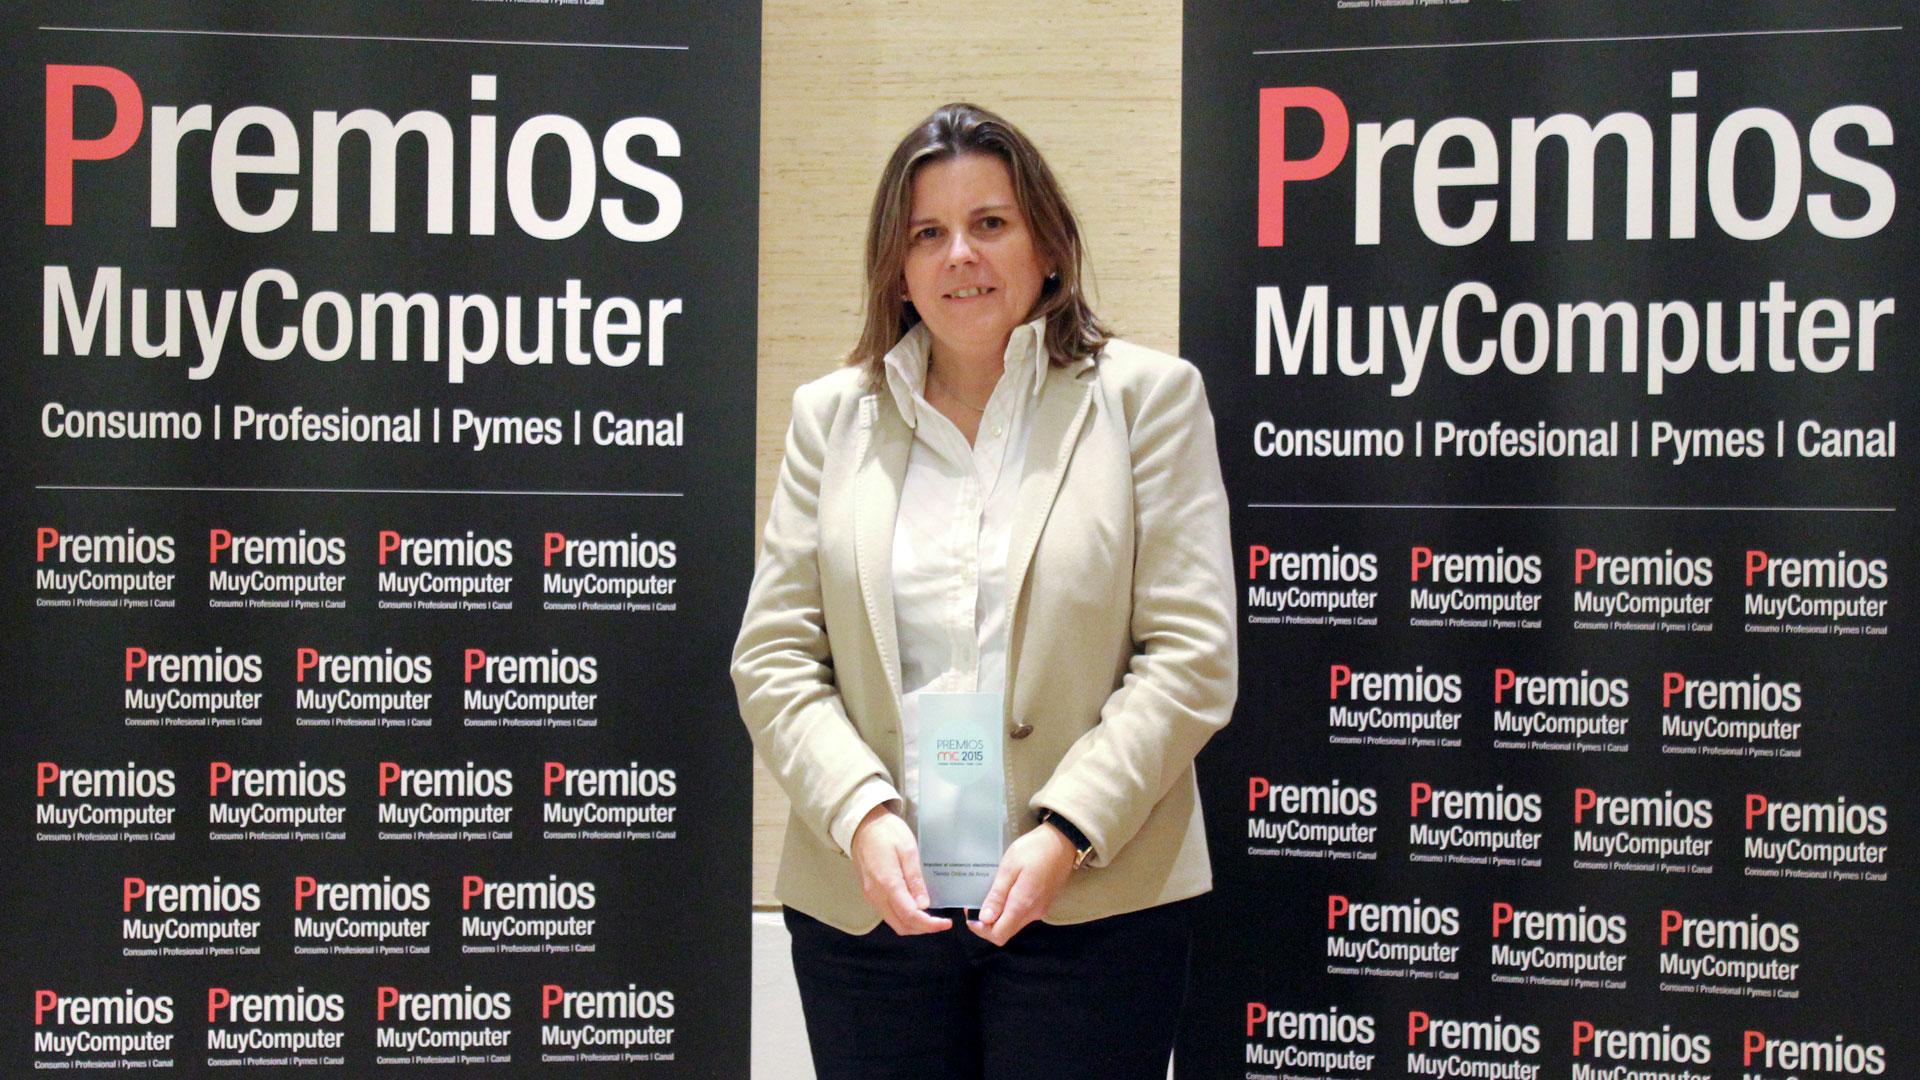 premios-mc2015-arsys-impulso-comercio-electronico